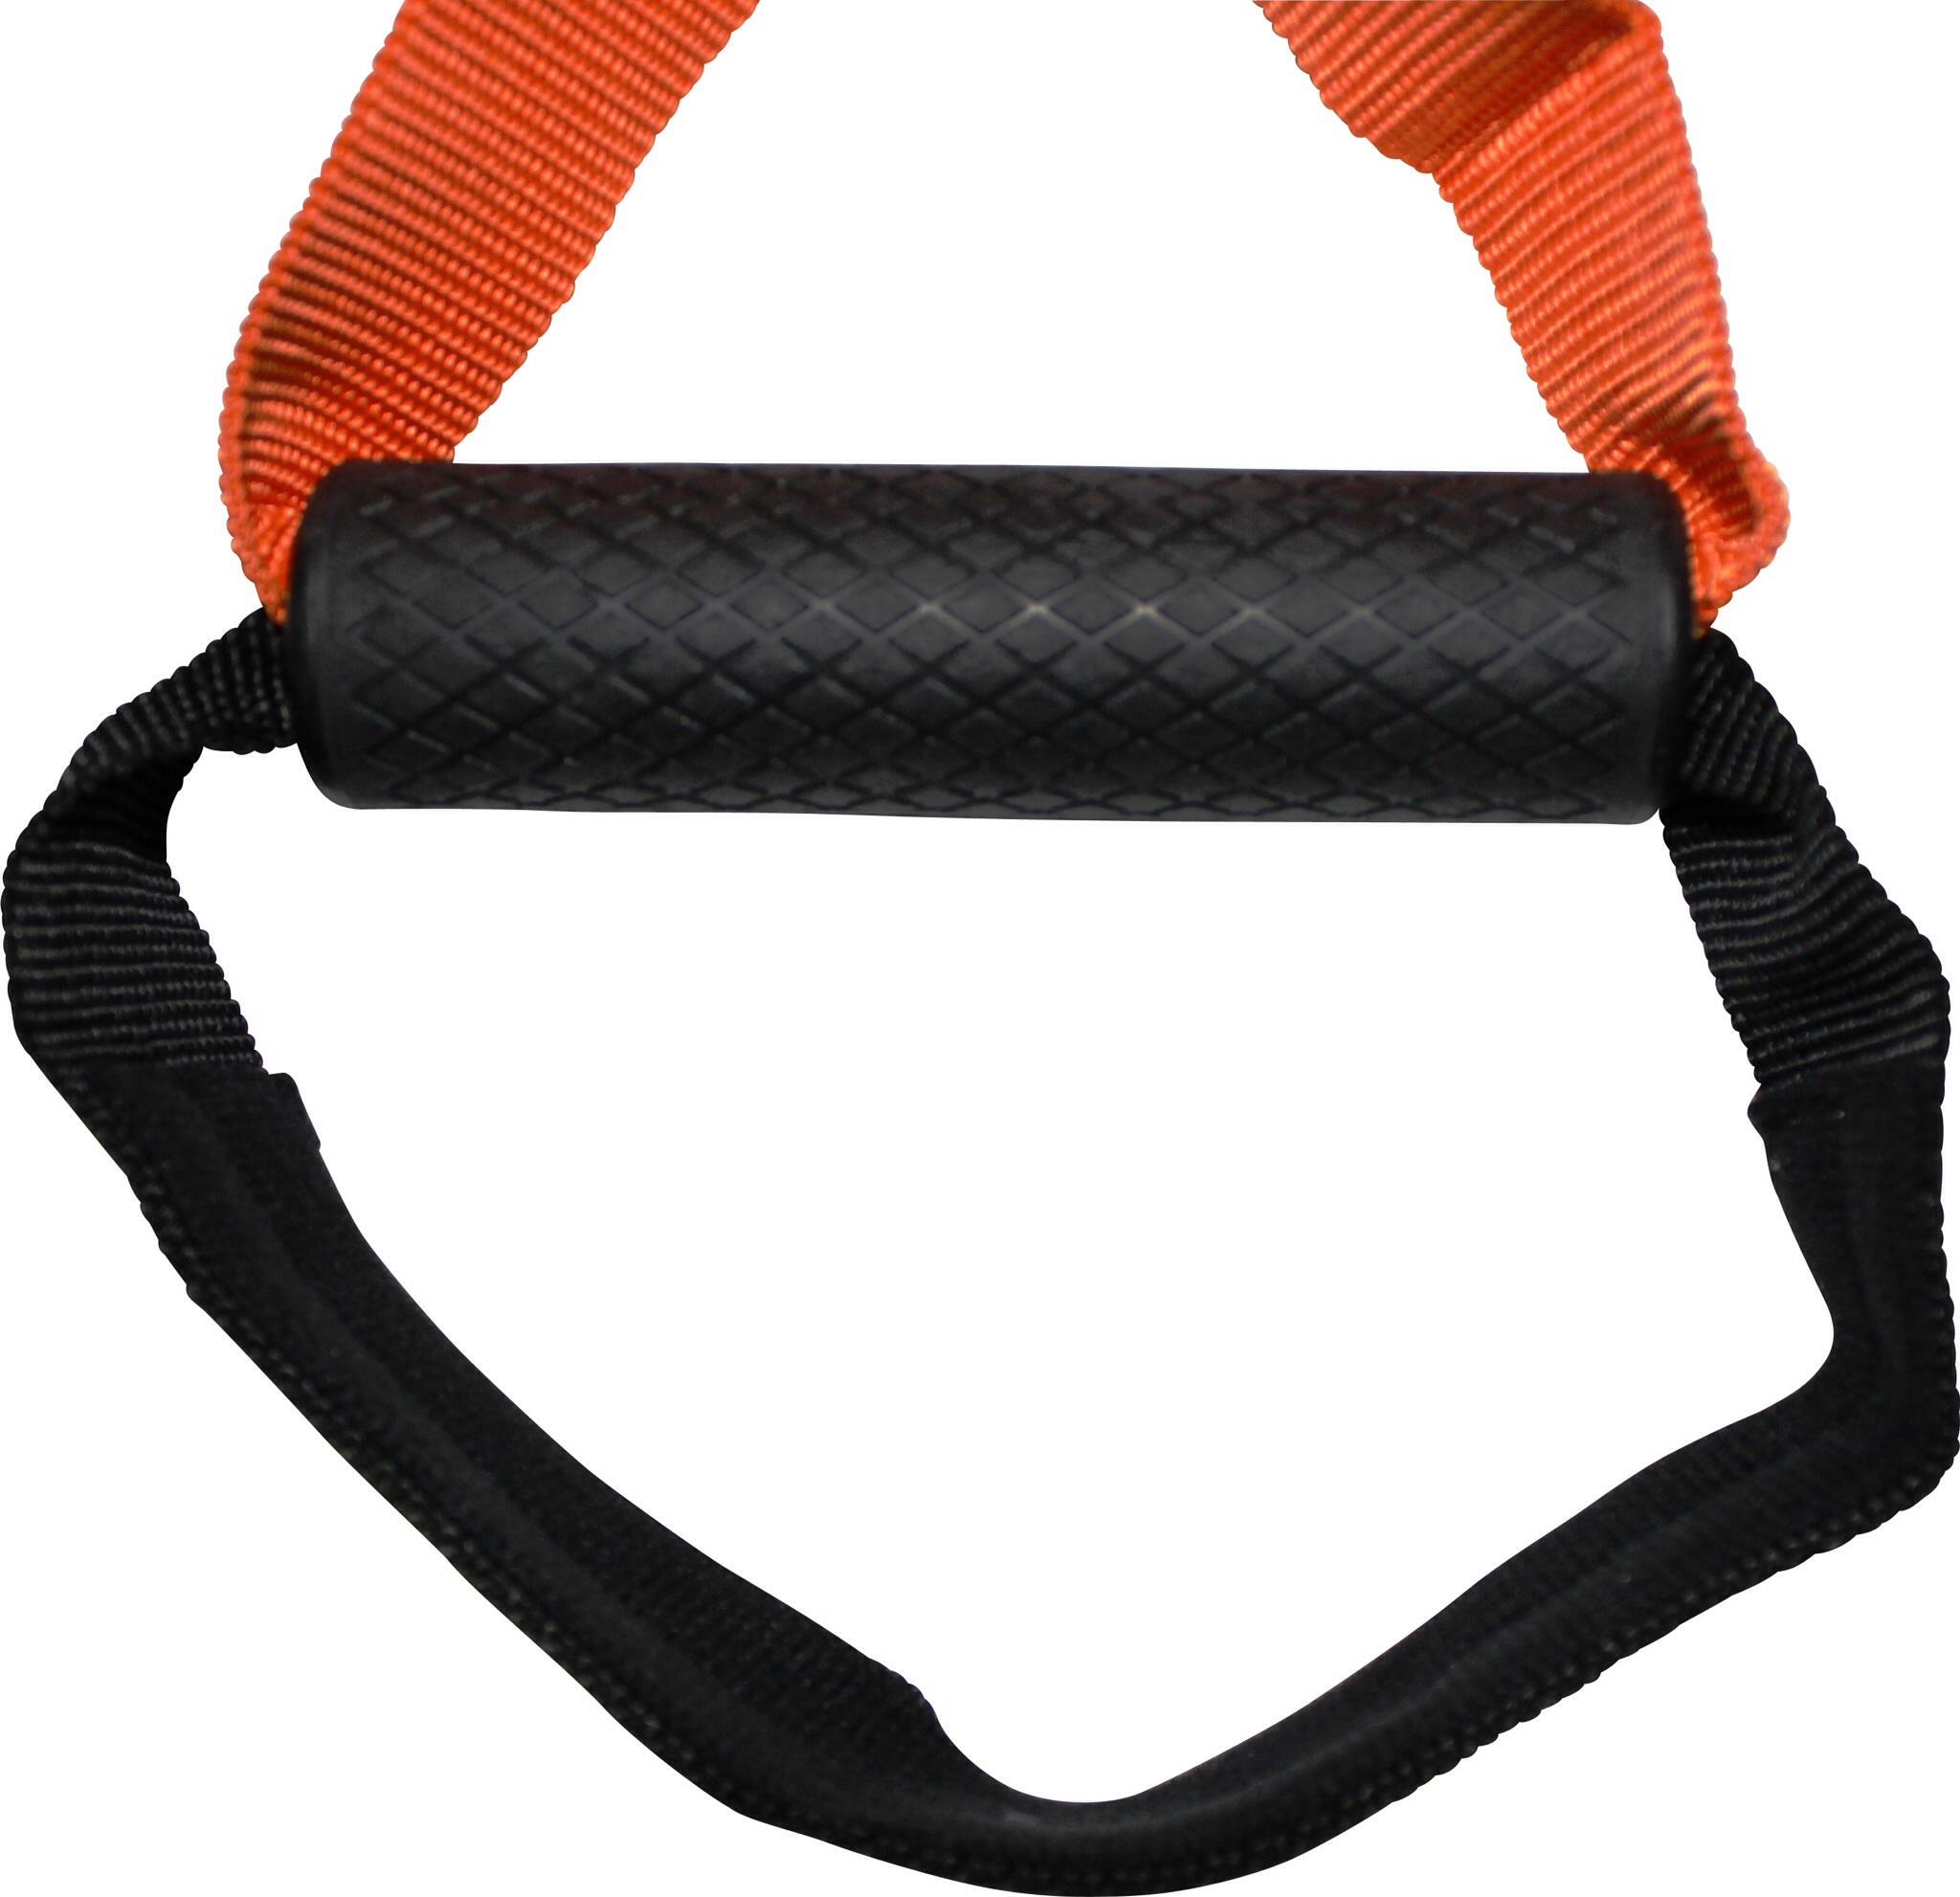 HANGTUFF suspension trainer -premium quality rubber hand grips